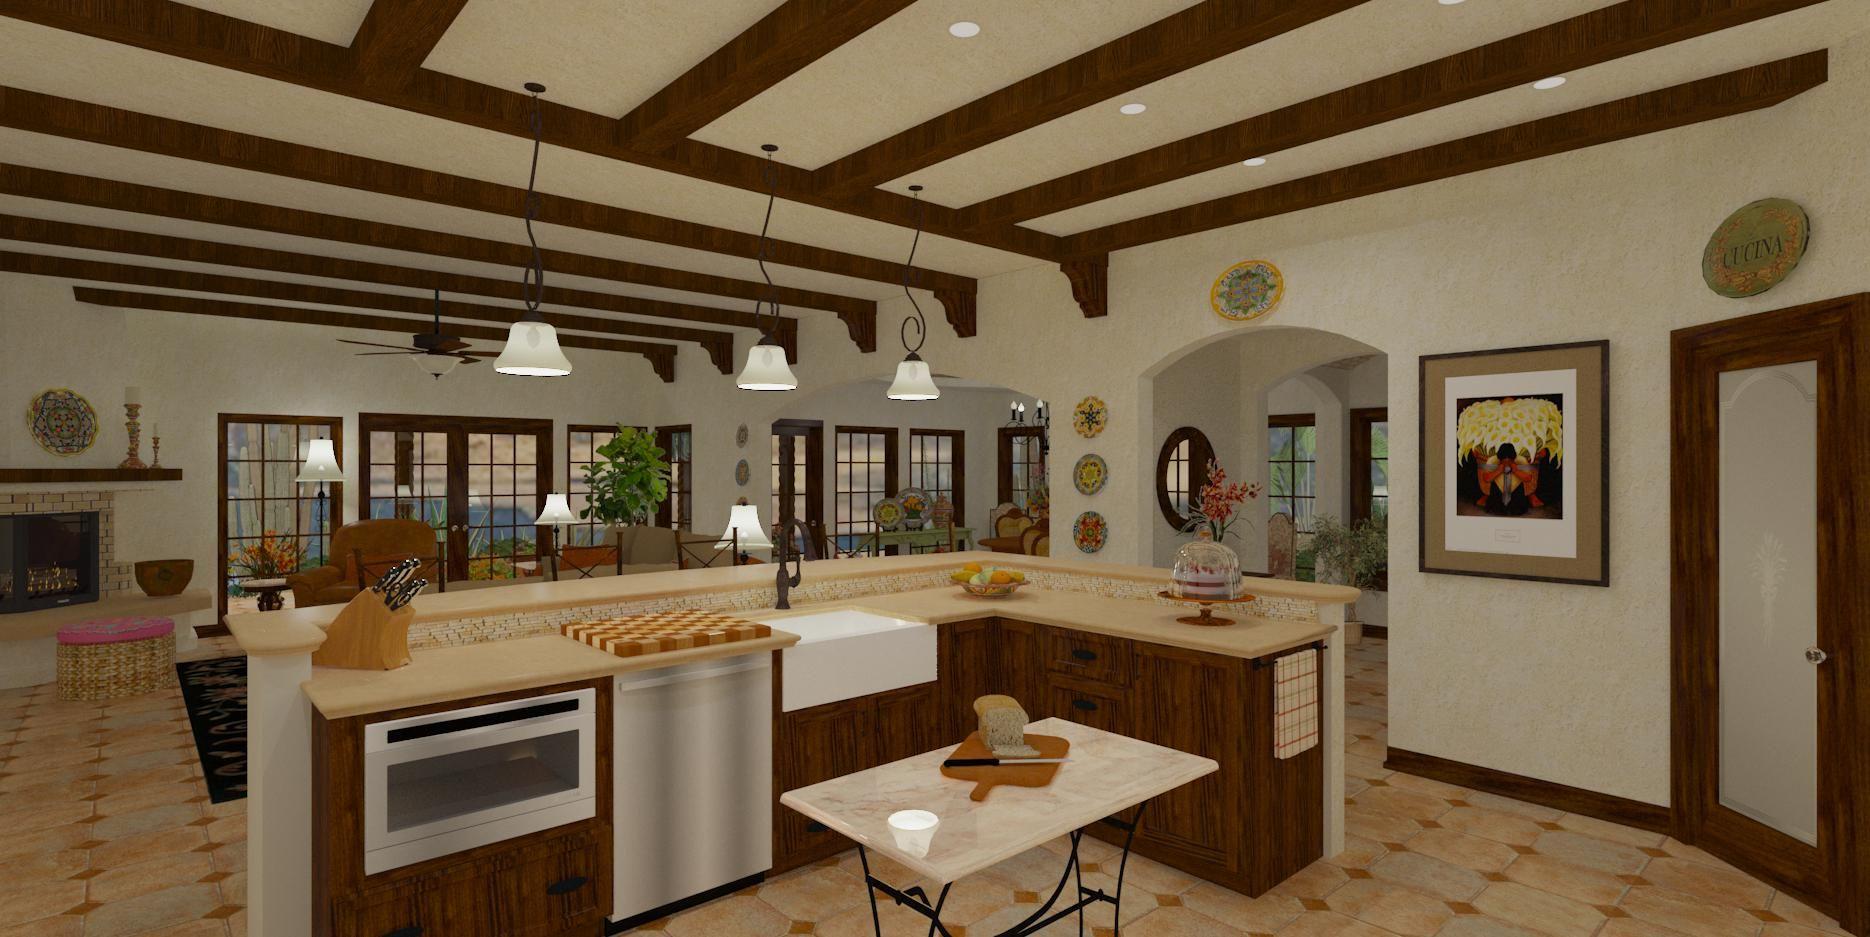 Spanish Home Decor Spanish Home Decor Vintage Spain House Decorating Ideas Spanish